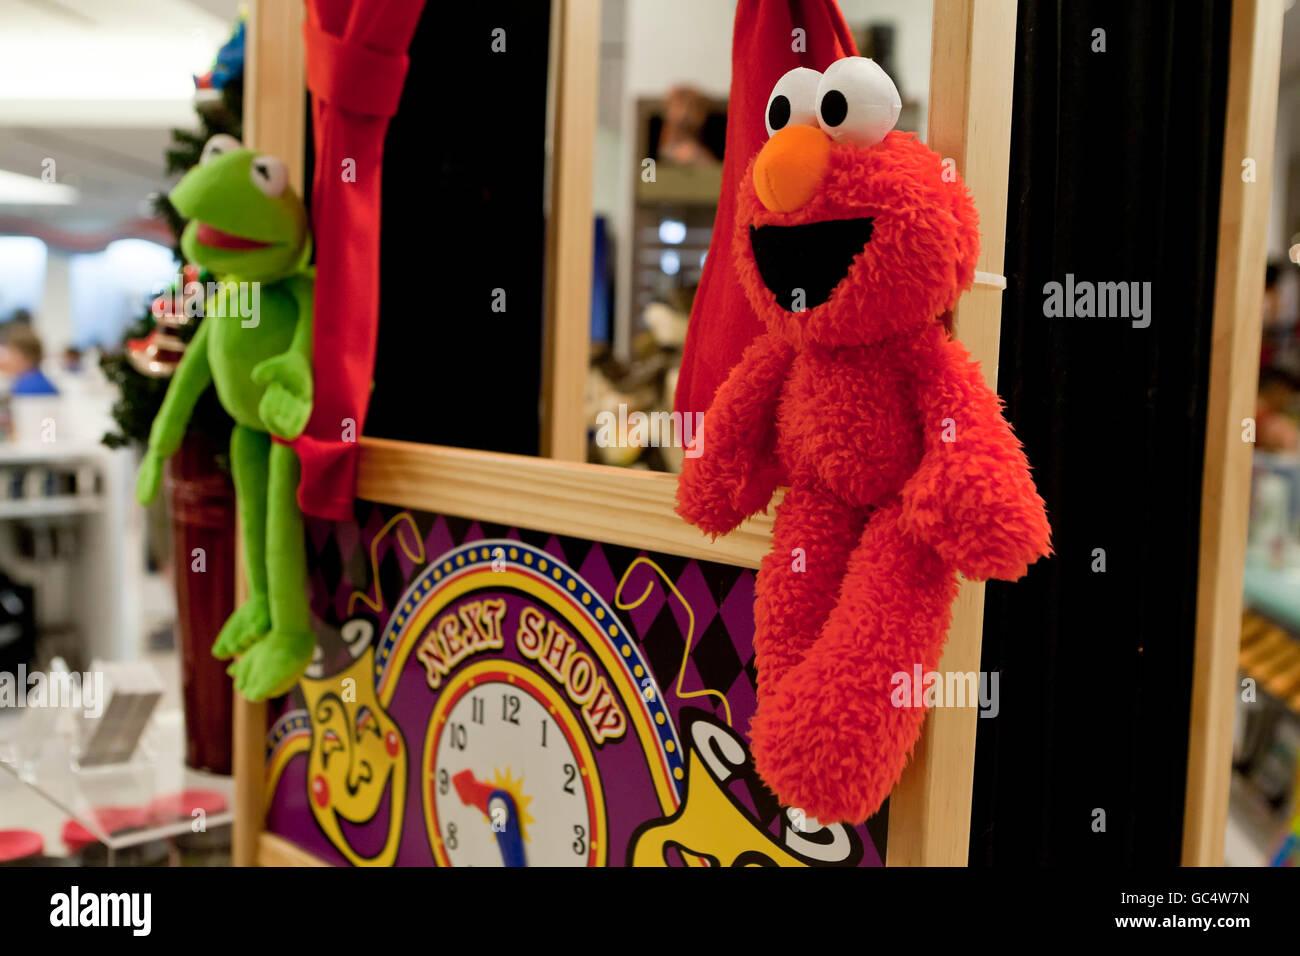 Sesame Street Charakter Spielzeug im Spielzeugladen - USA Stockfoto ...